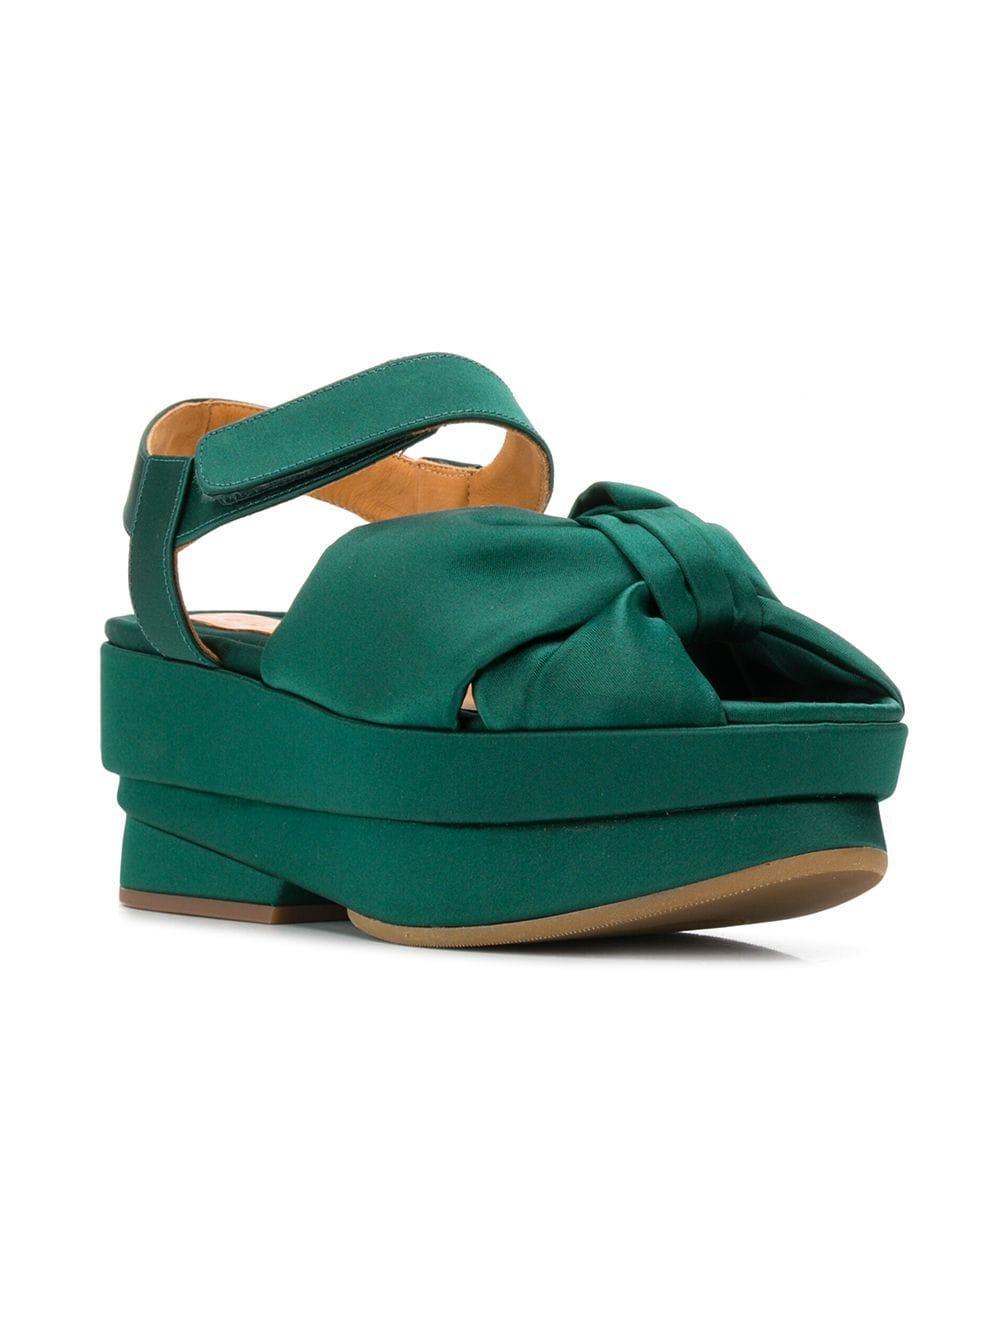 Draga Lyst In Mihara Sandals Chie Green EPw7PYq